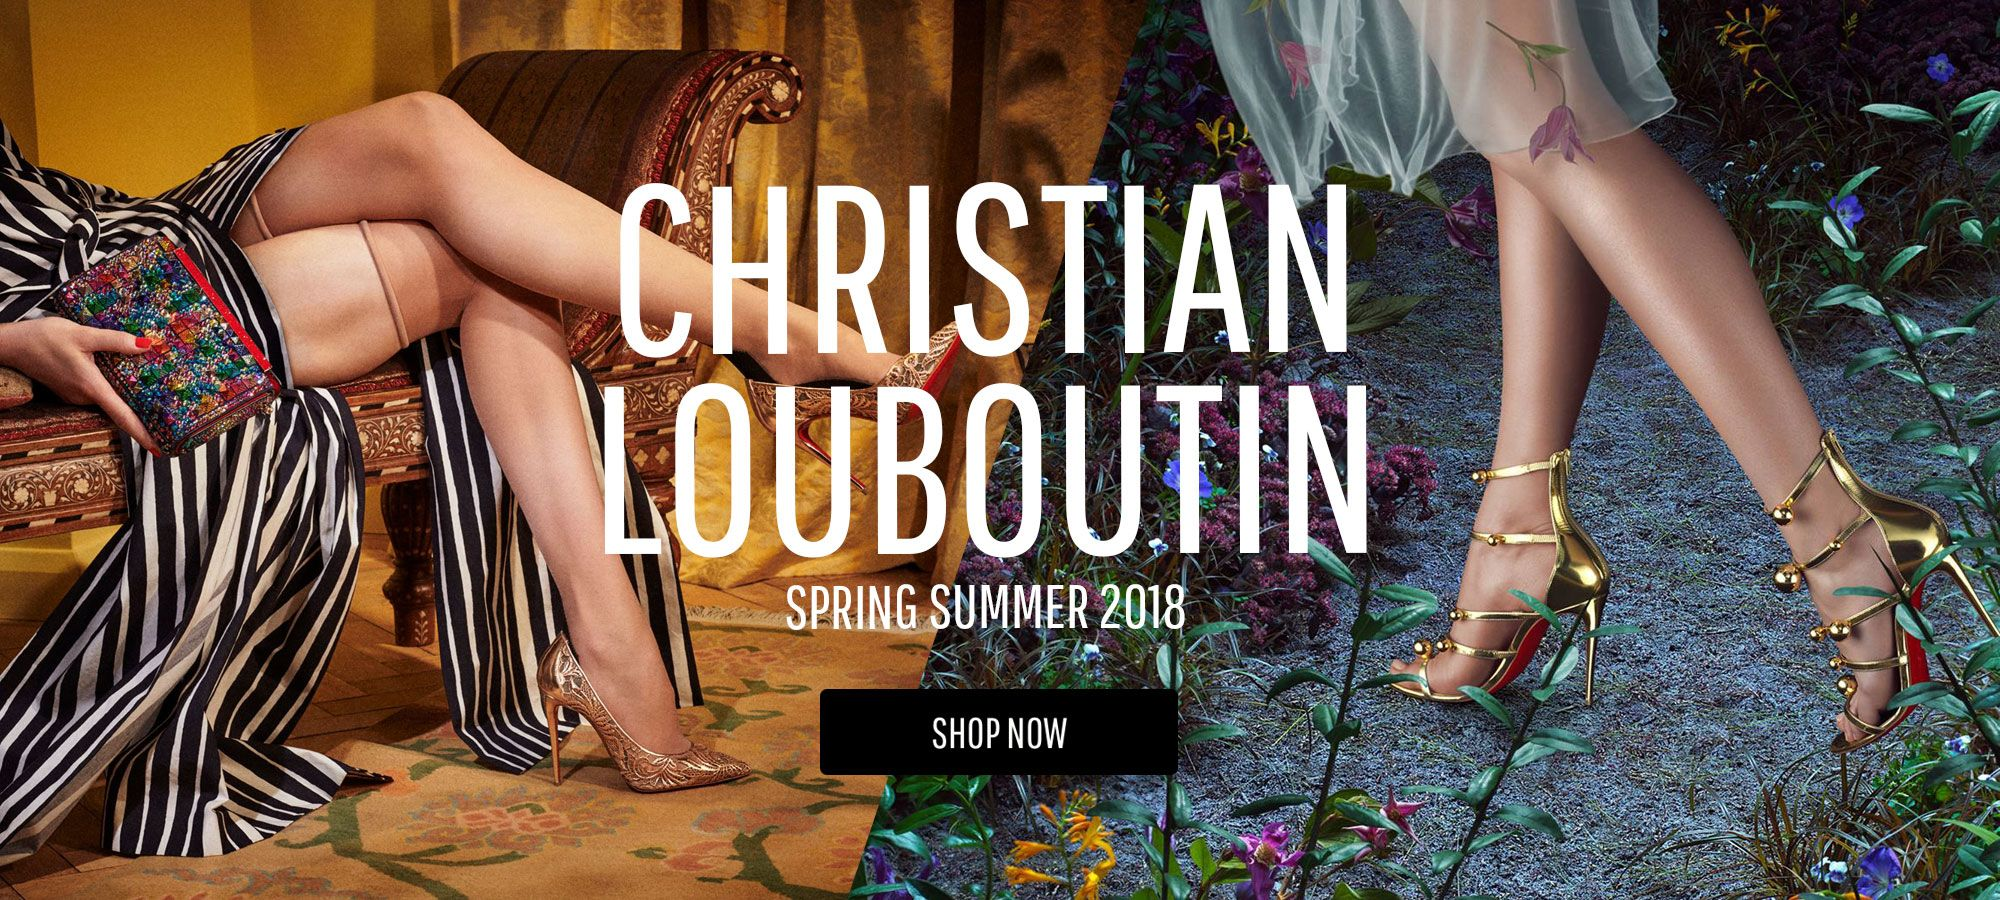 Christian Louboutin Women - Spring Summer 2018